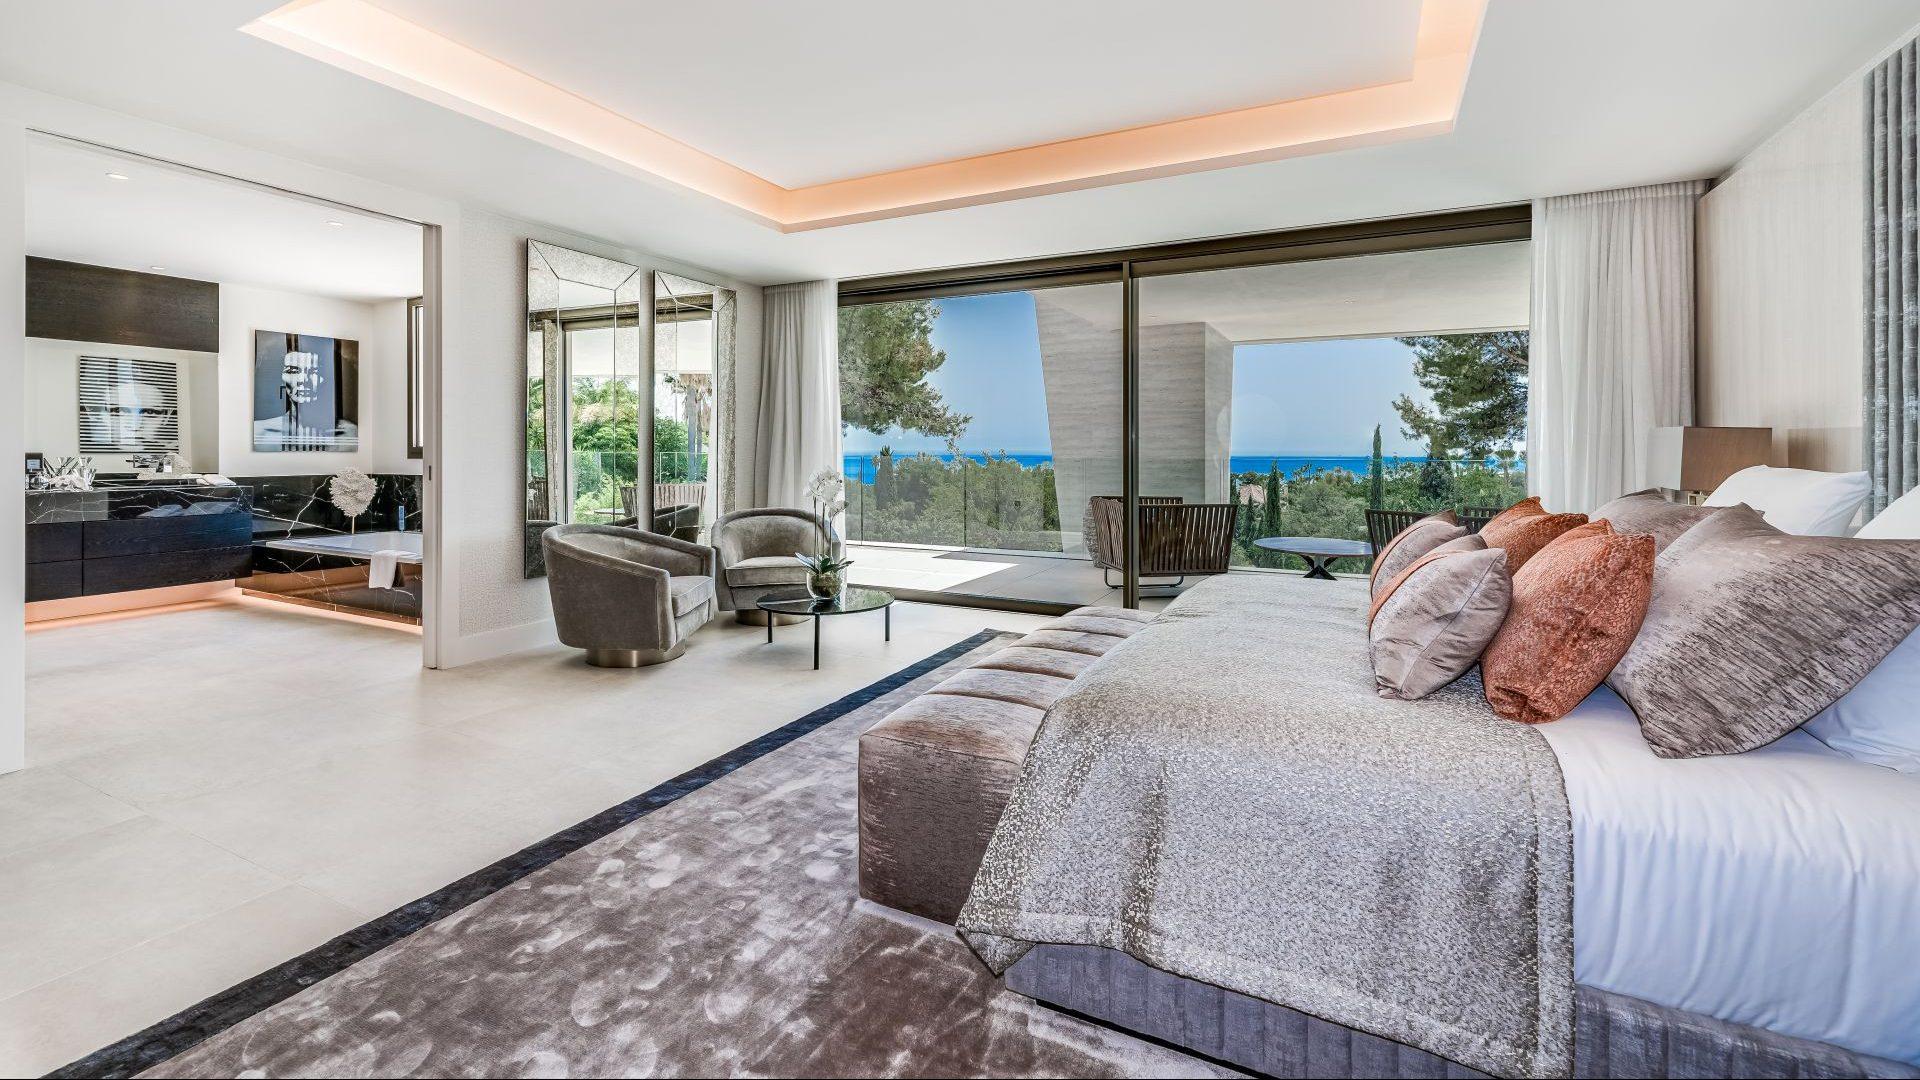 Main bedroom with open plan en-suite bathroom and views of the sea